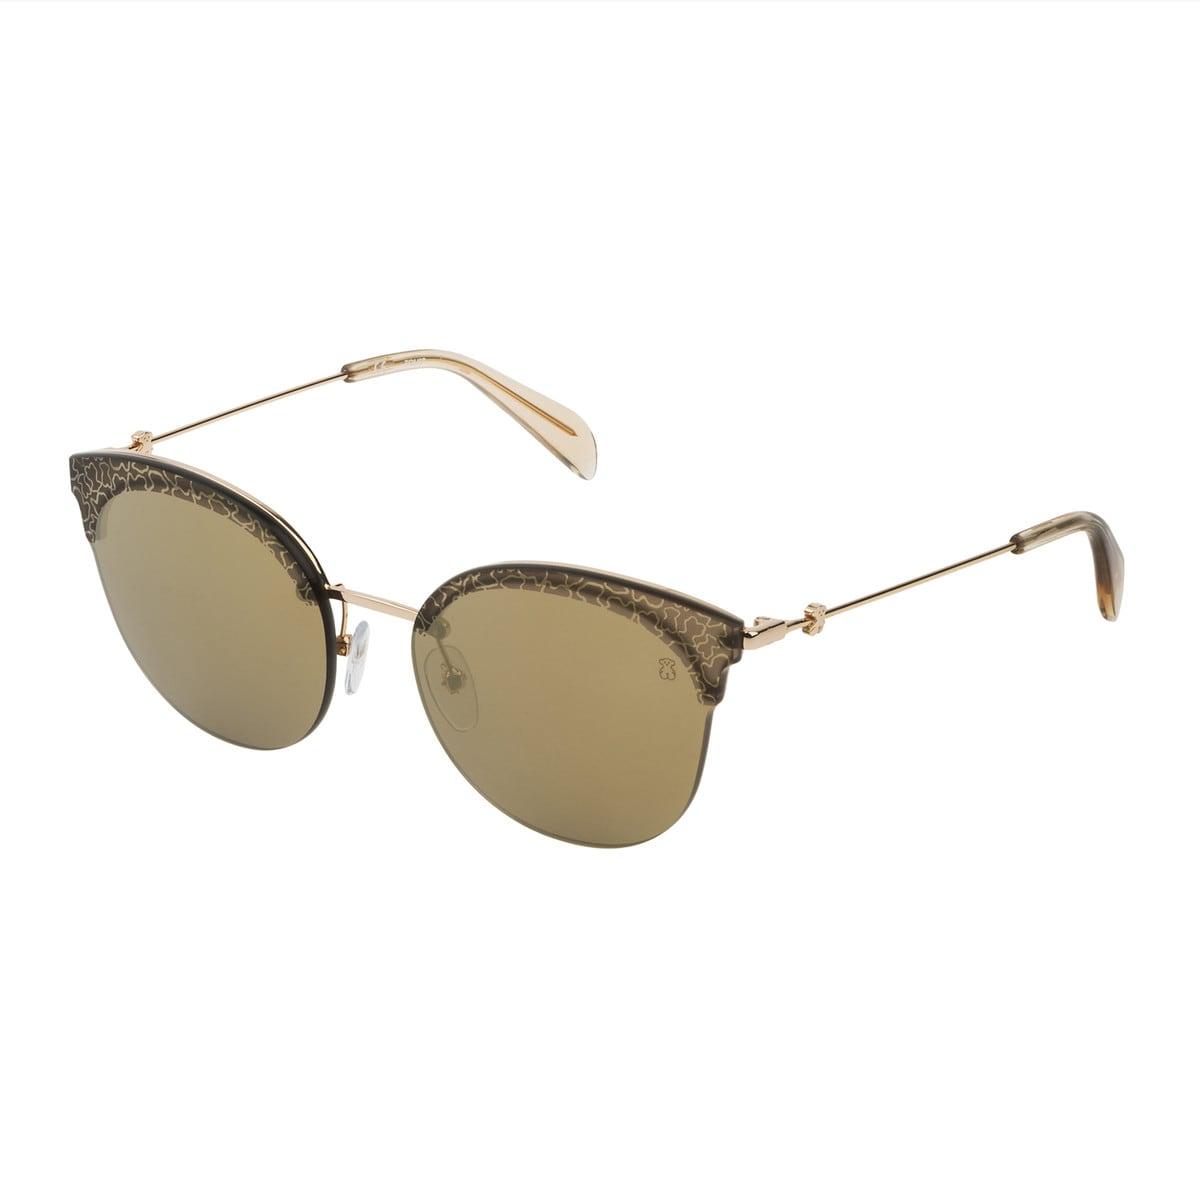 Goldfarbene Sonnenbrille Metal Matte aus Metall